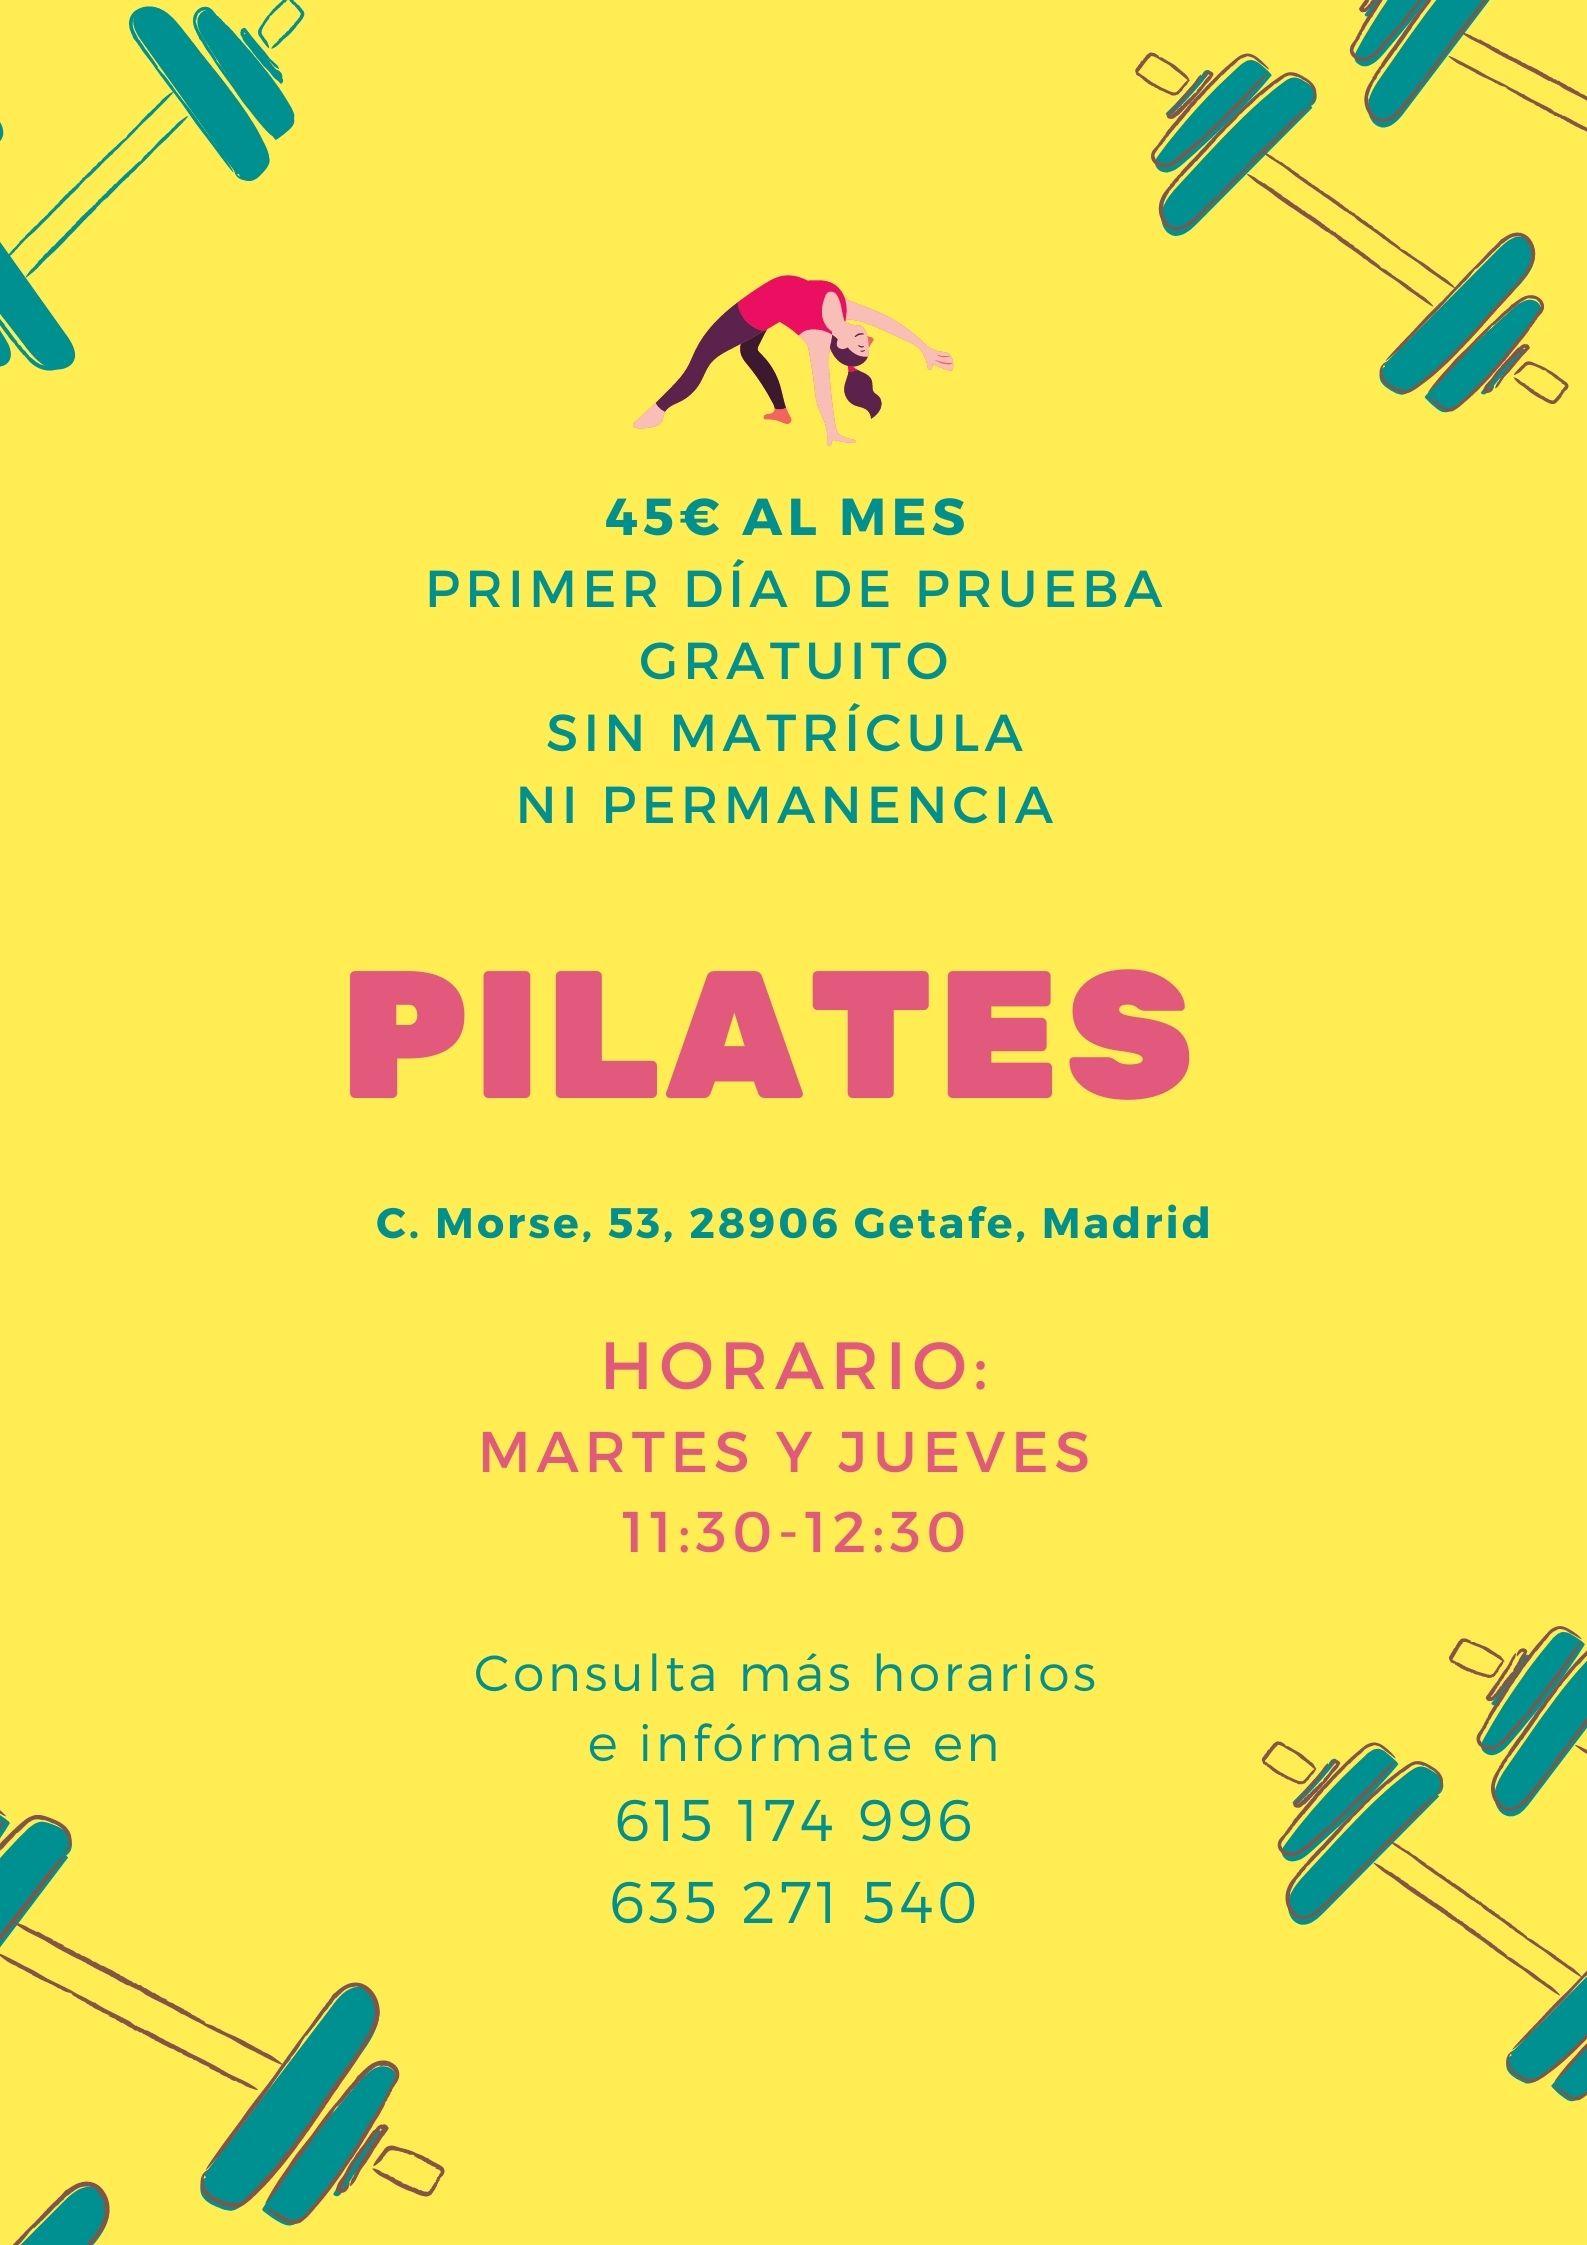 Pilates en Getafe